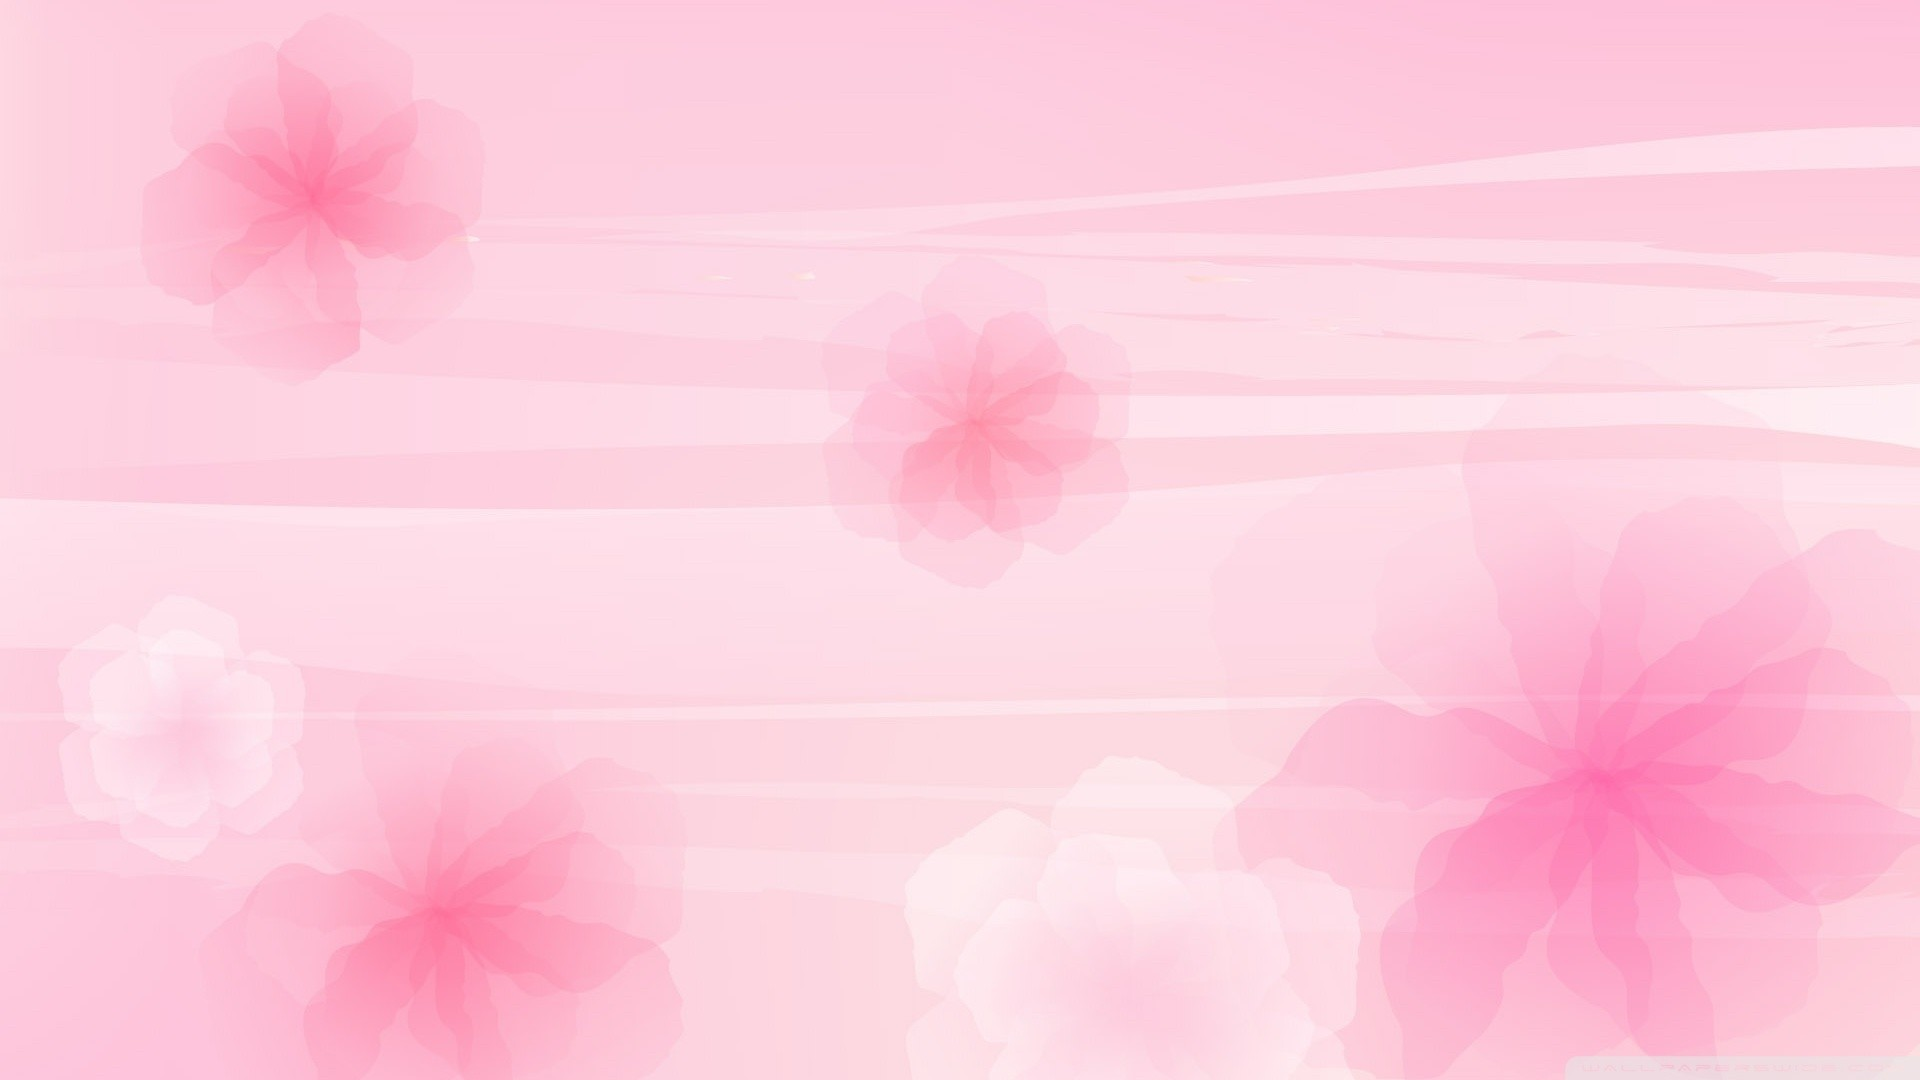 Pink Flower Background 47 Images